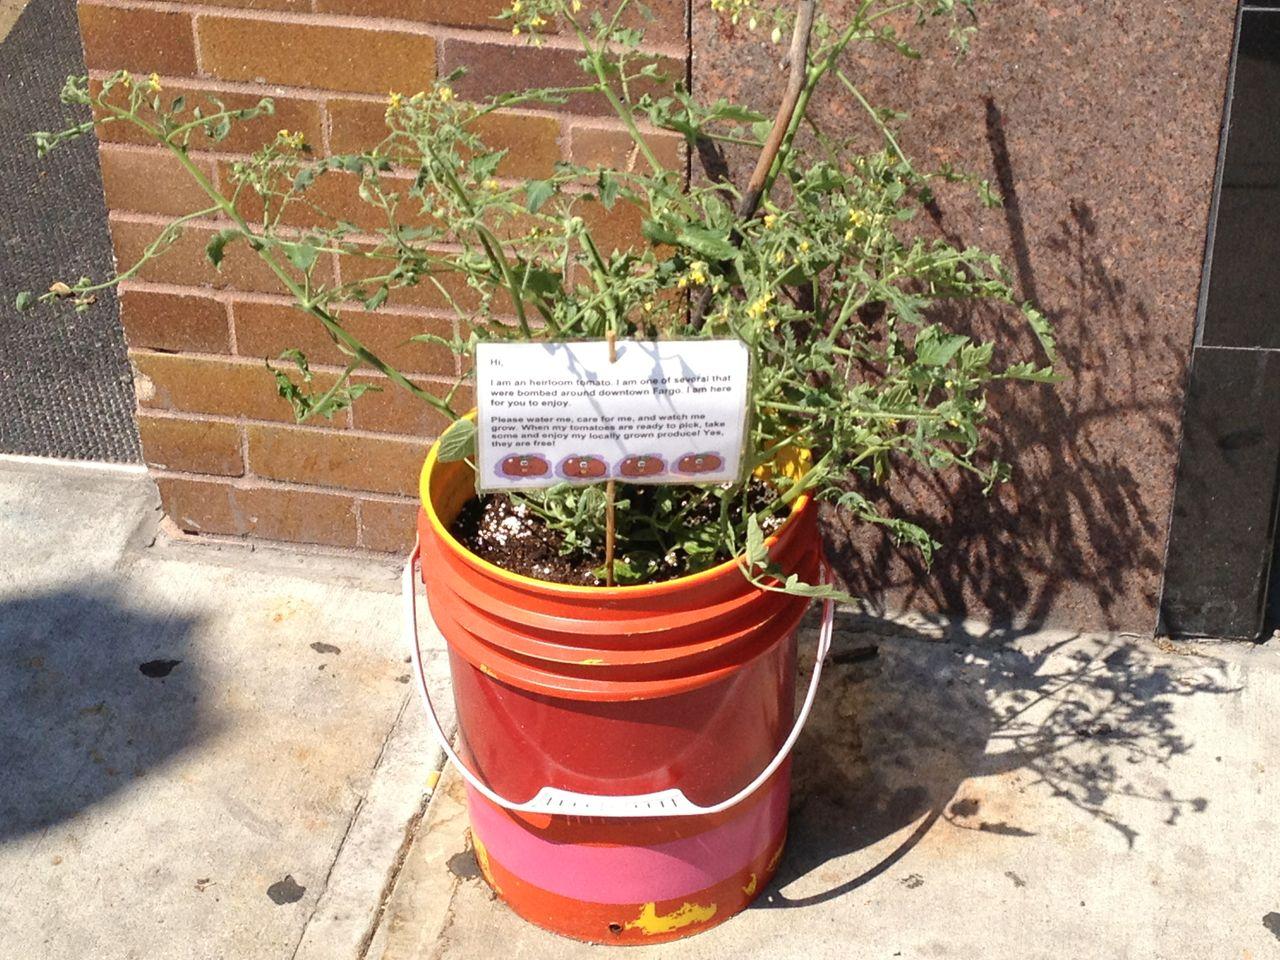 Tomato Plant Bombs Causing Fear of Terrorist Activity